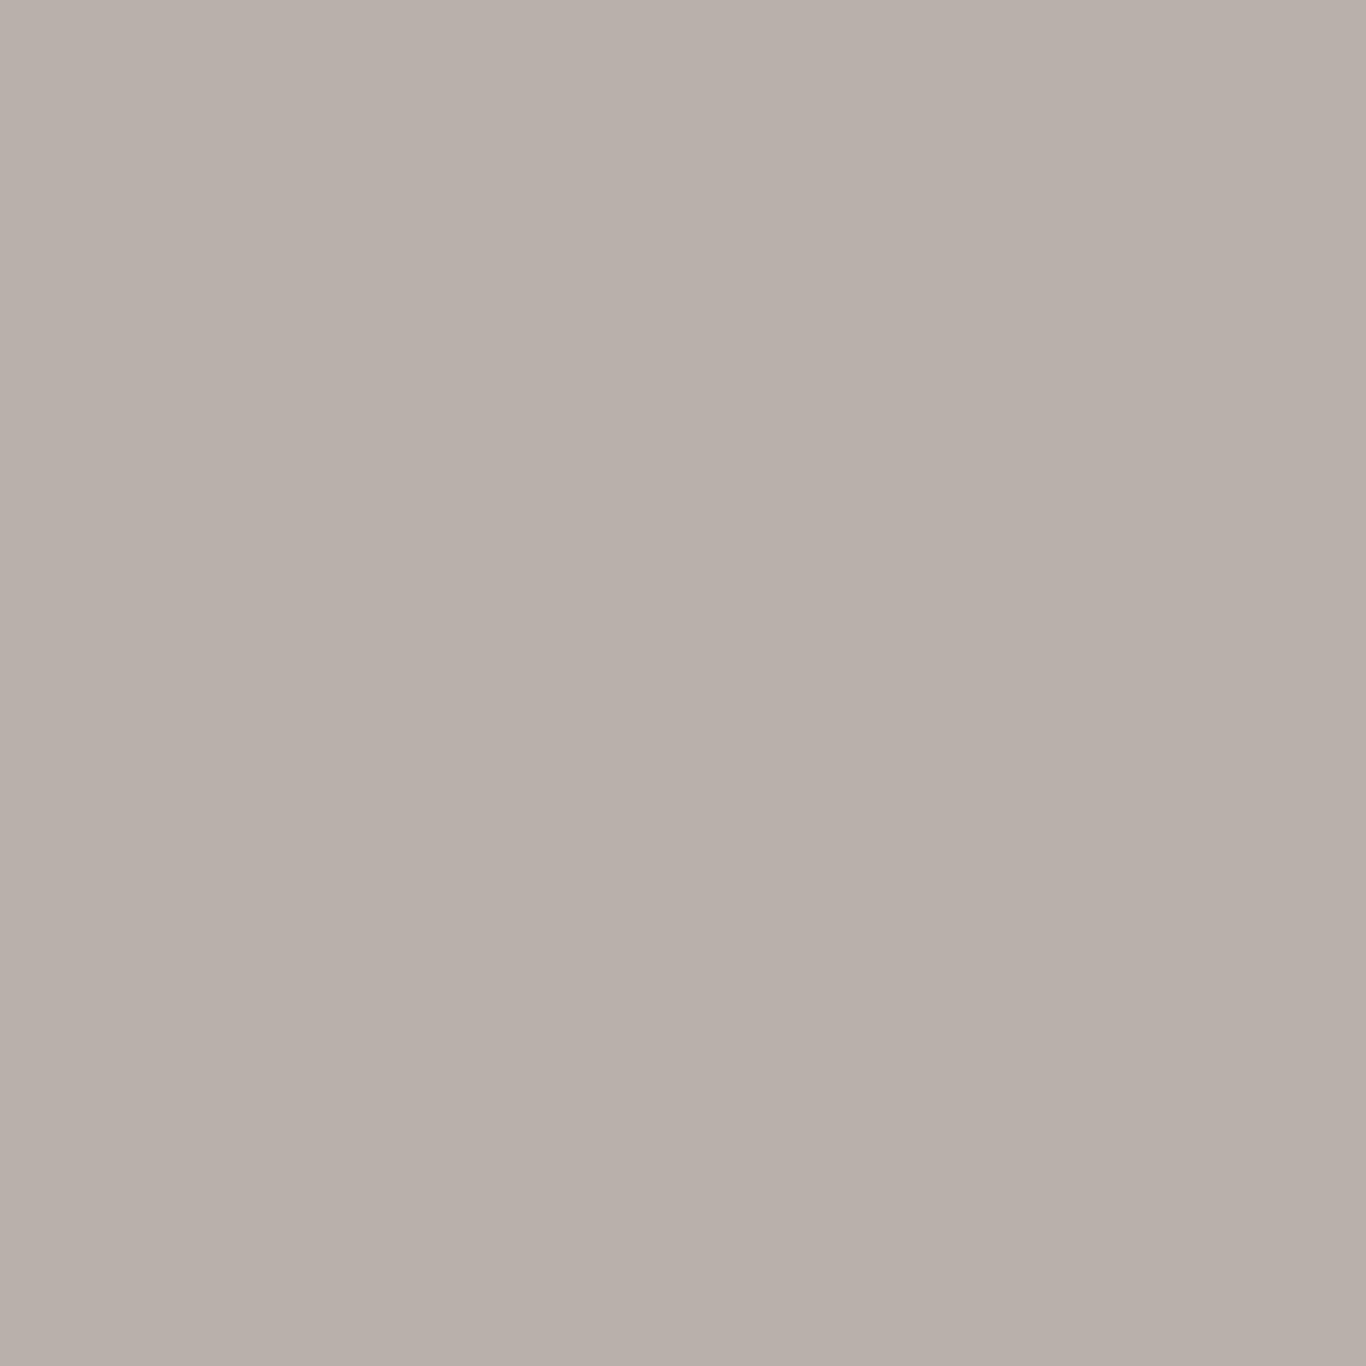 Sanderson Paint Starling